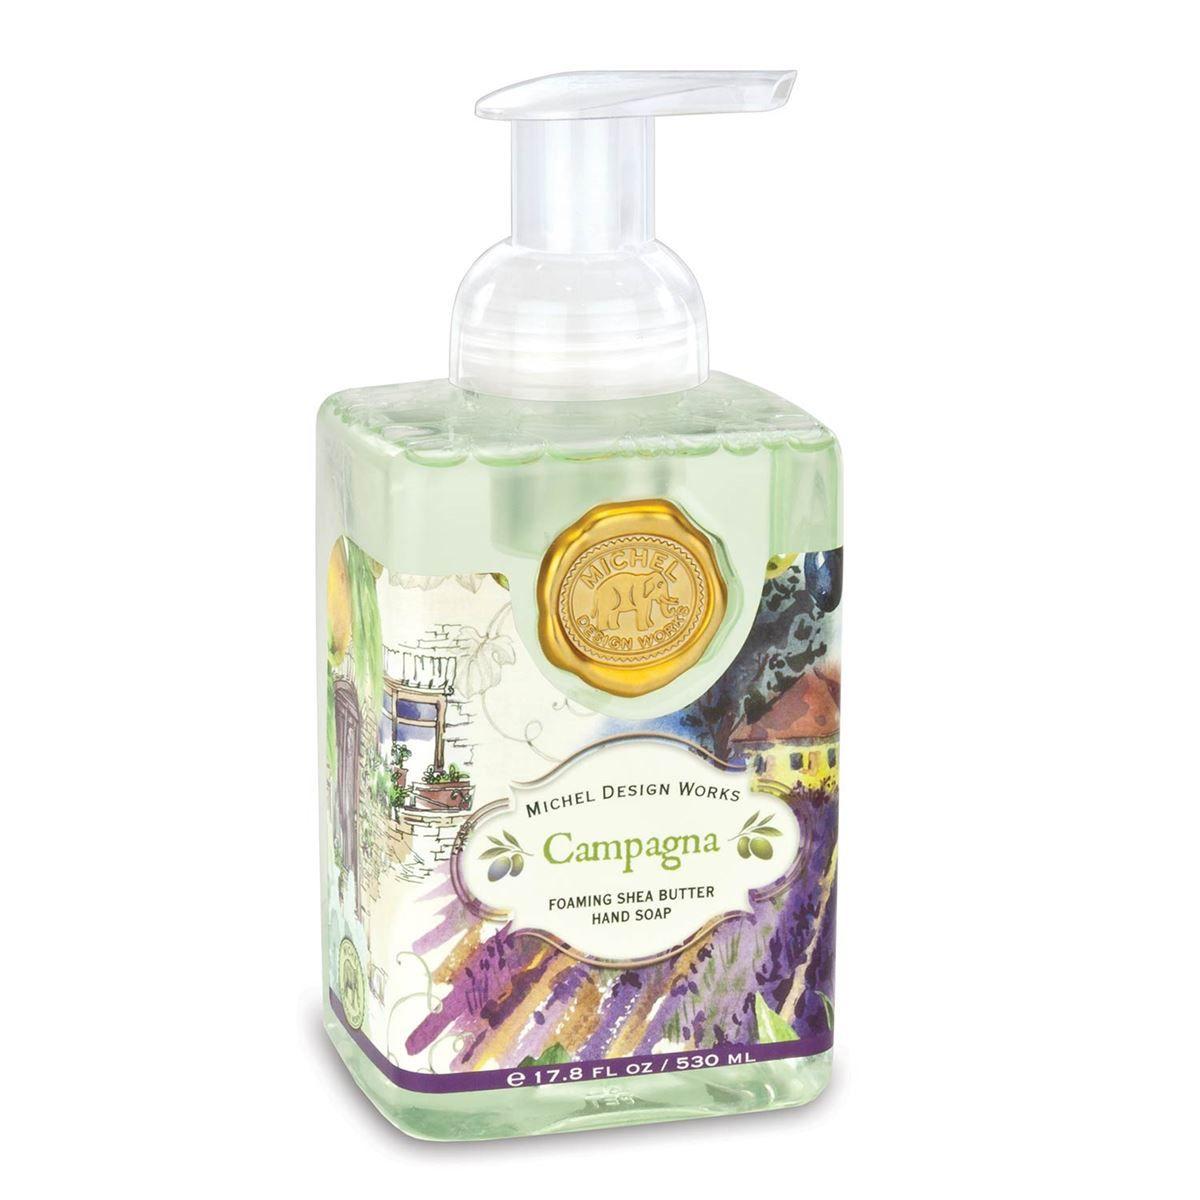 Related image Foaming hand soap, Foam soap